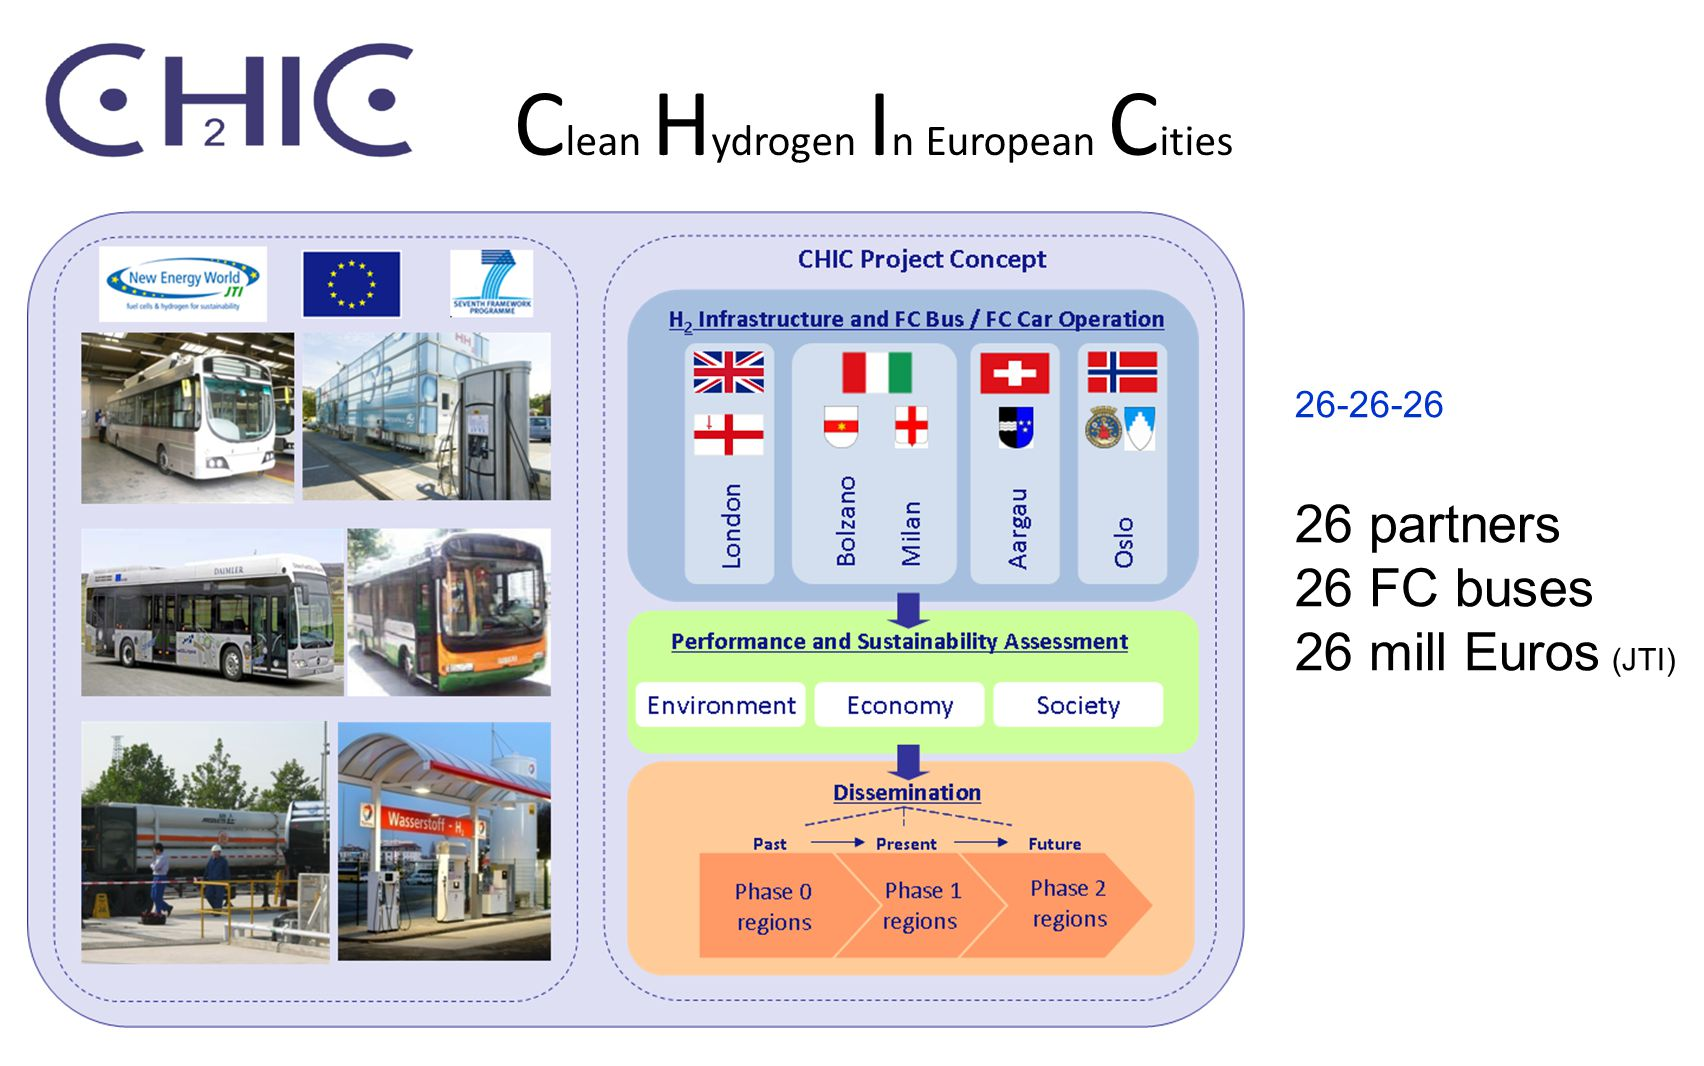 C lean H ydrogen I n European C ities 26-26-26 26 partners 26 FC buses 26 mill Euros (JTI)